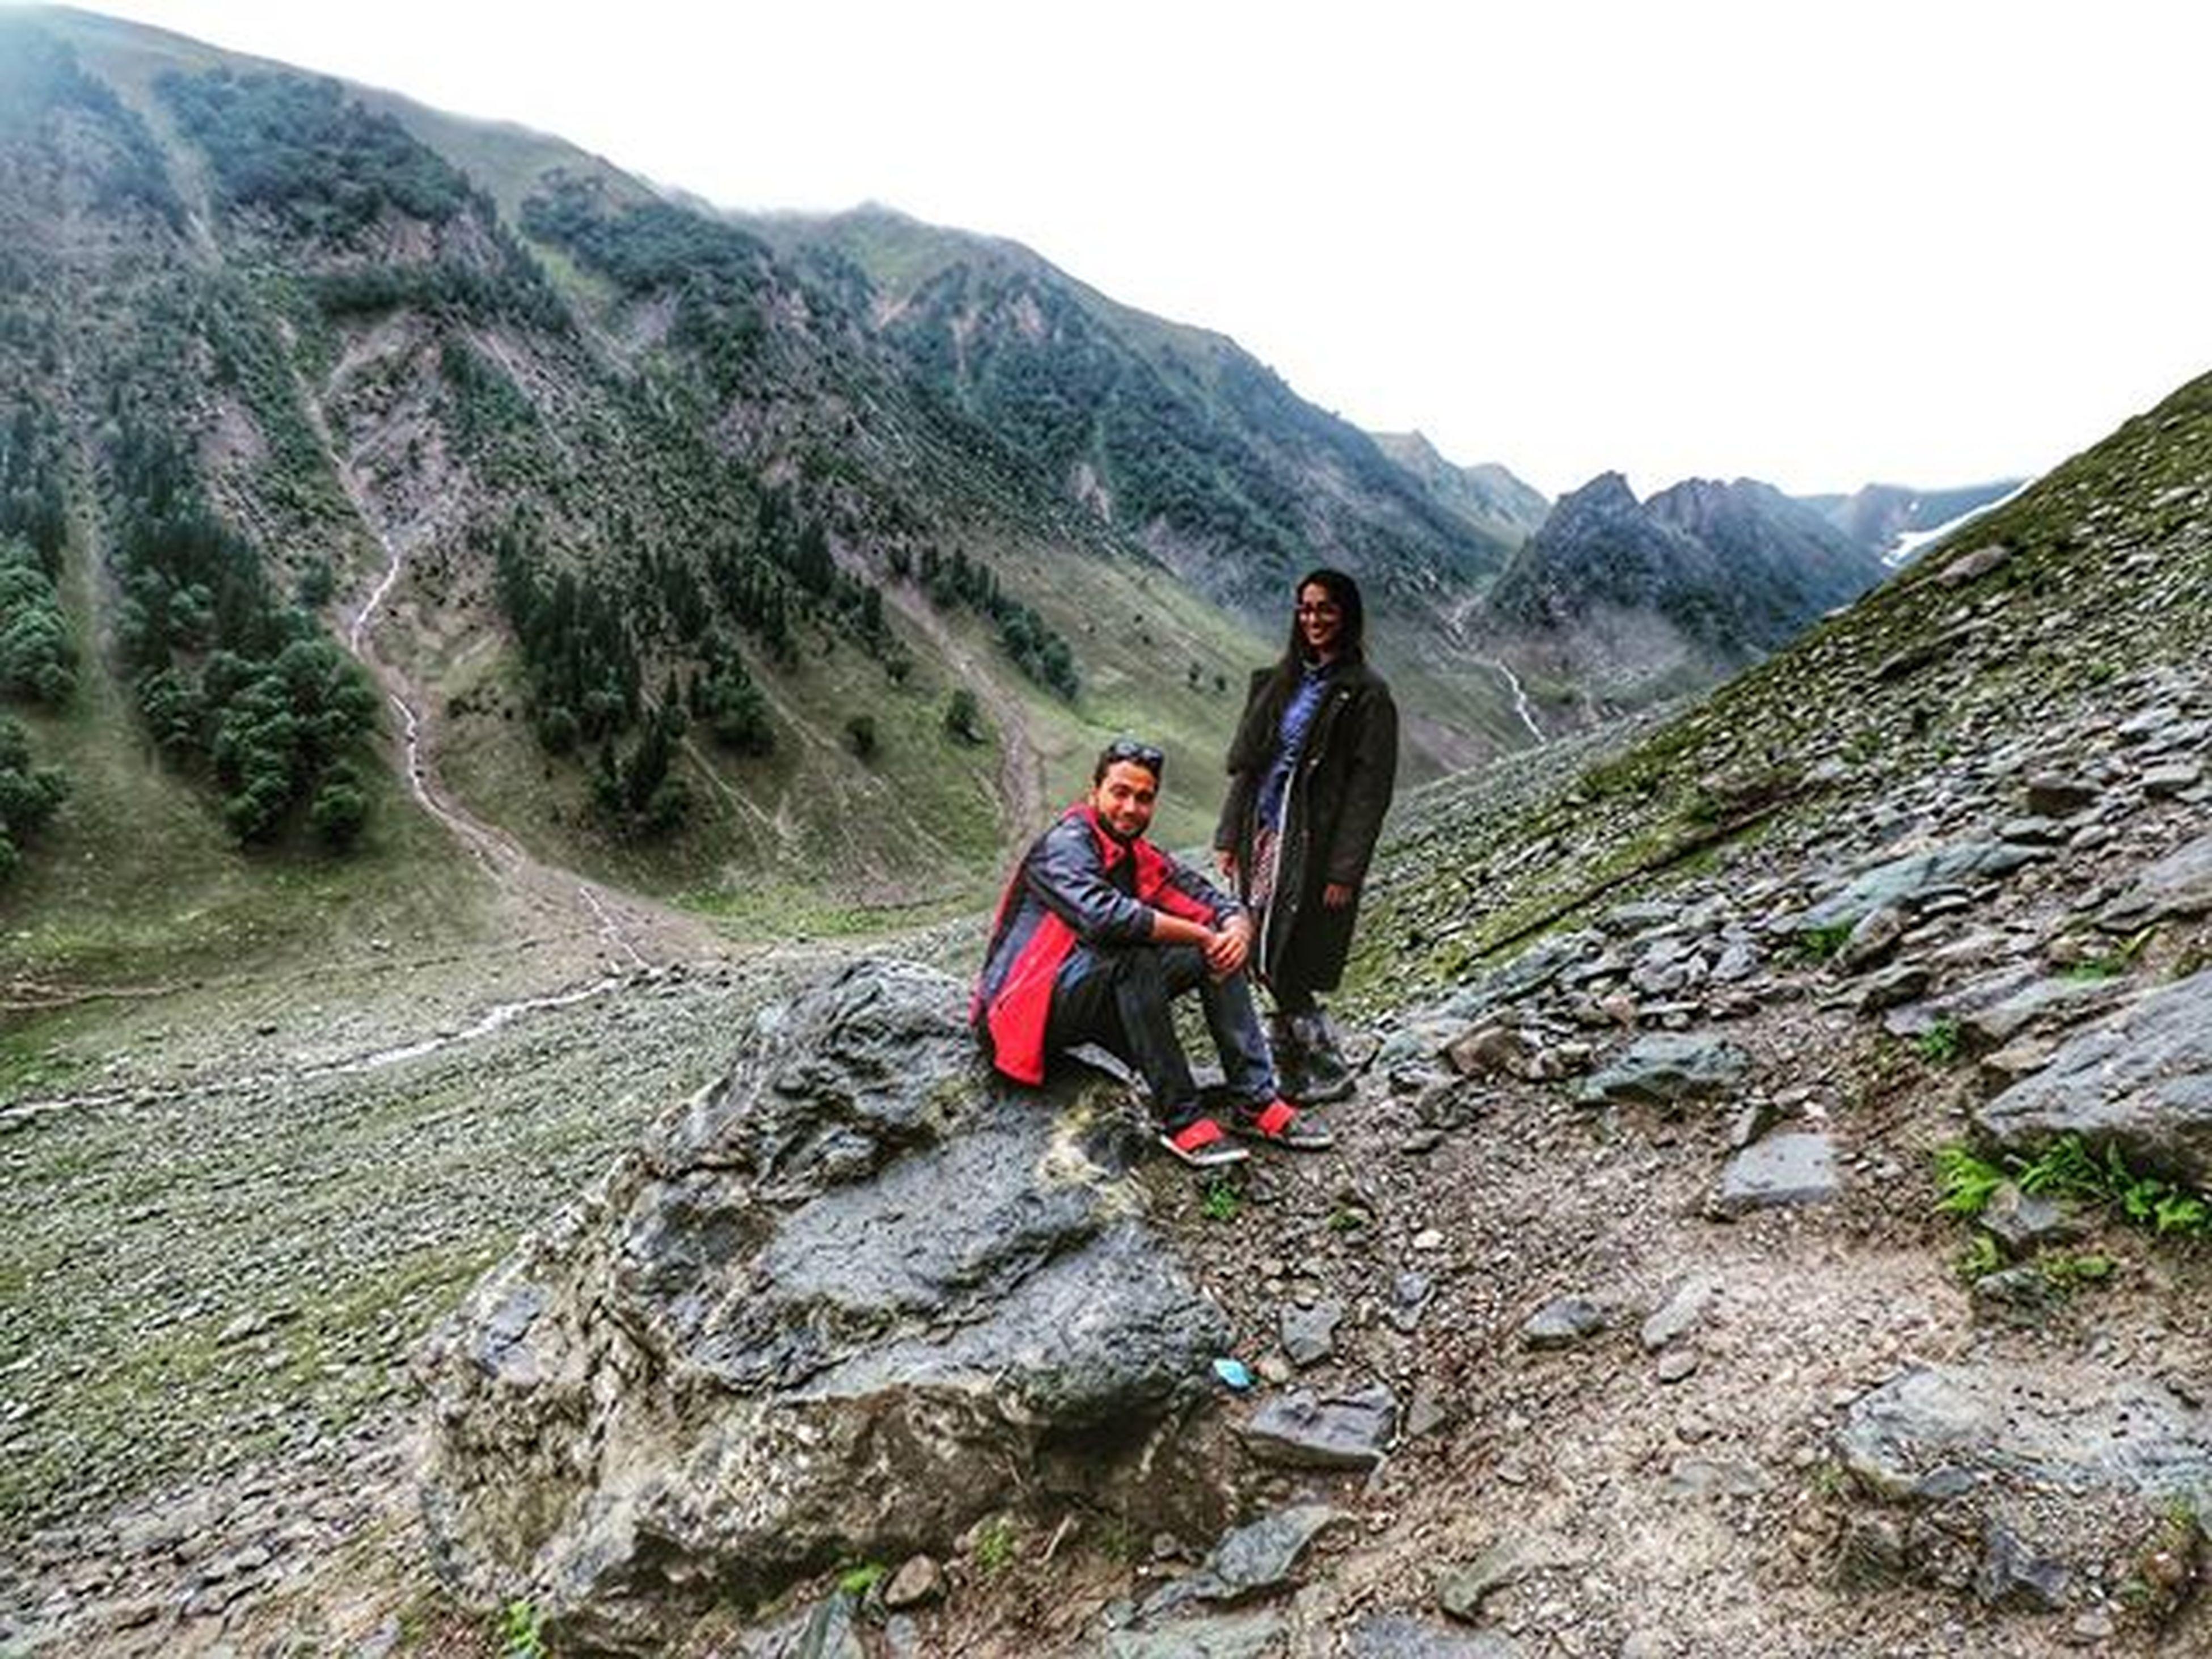 Wataview Instanature Kashmir Poshpathri CrazyWe Rain Sliperyrocks Firbhi Trekking Sneakers